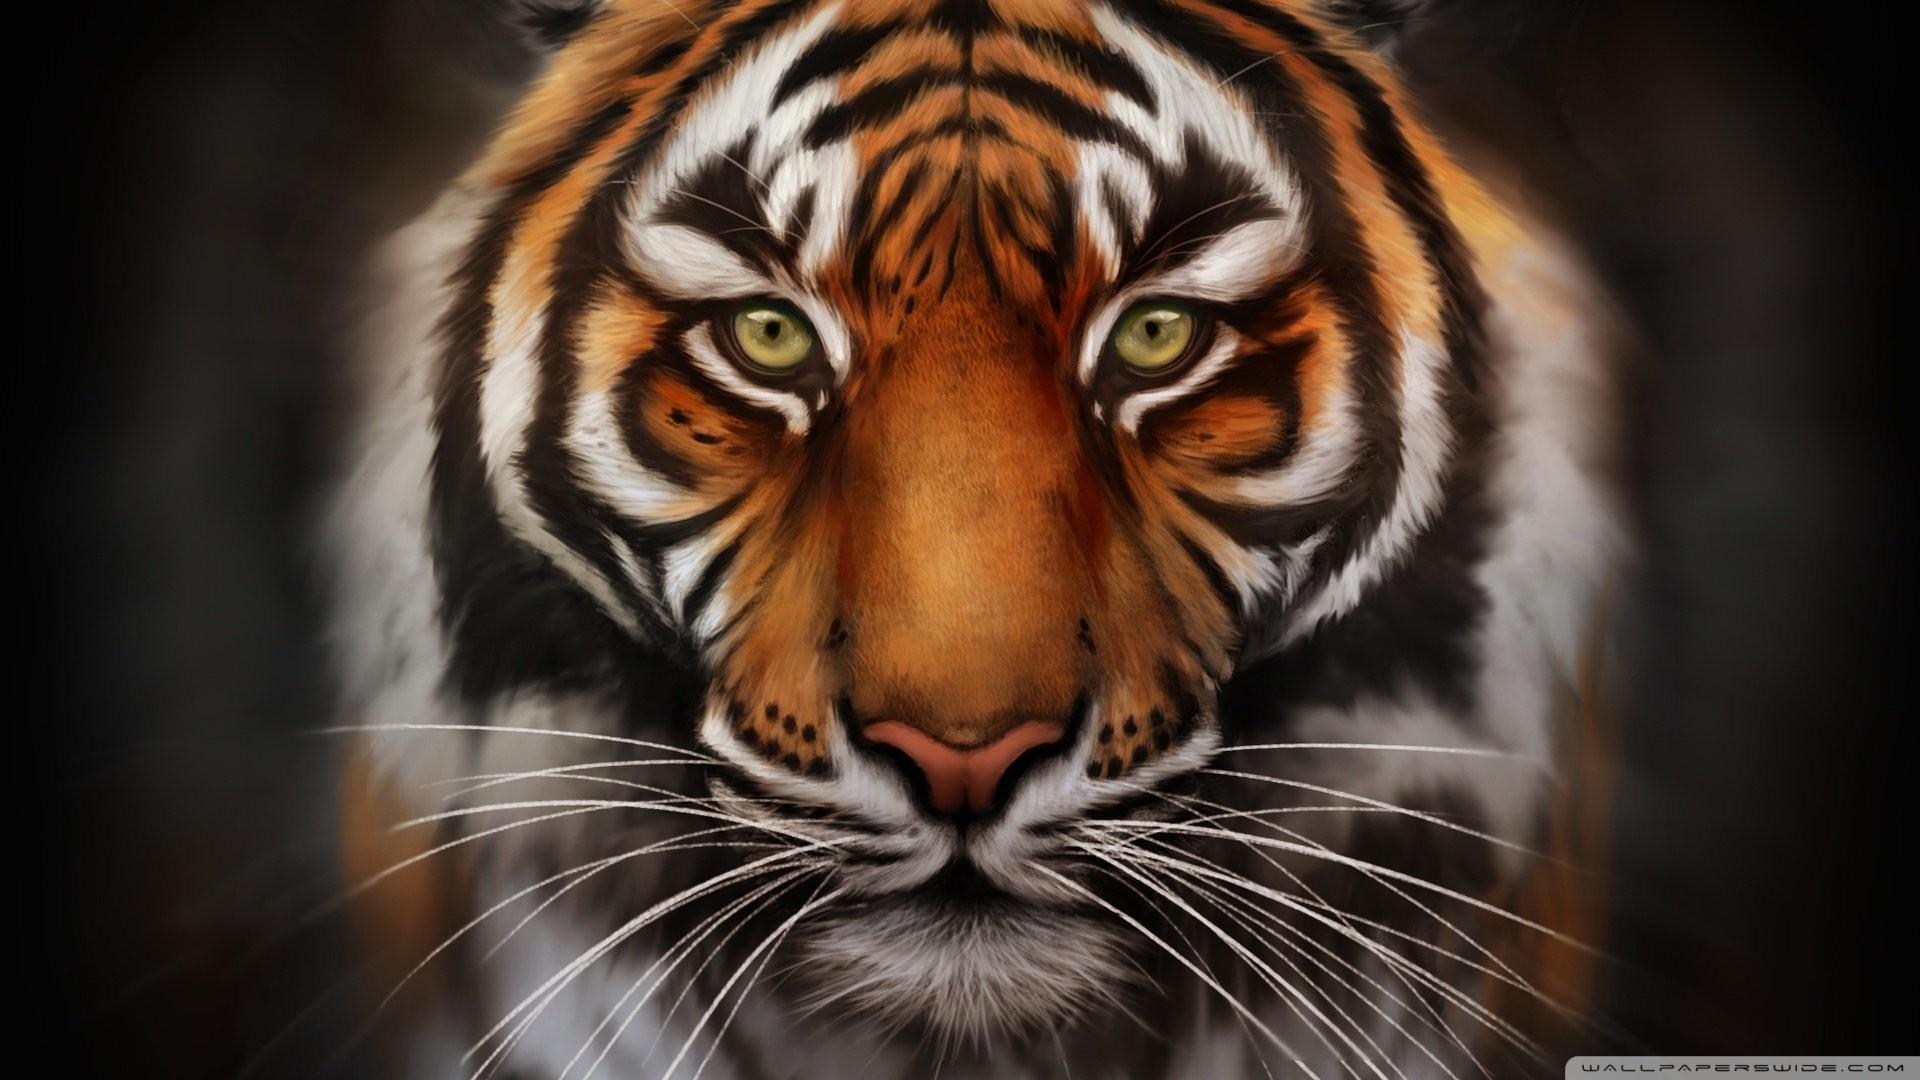 0 Tiger Wallpaper Full HD Tiger Wallpaper Full HD